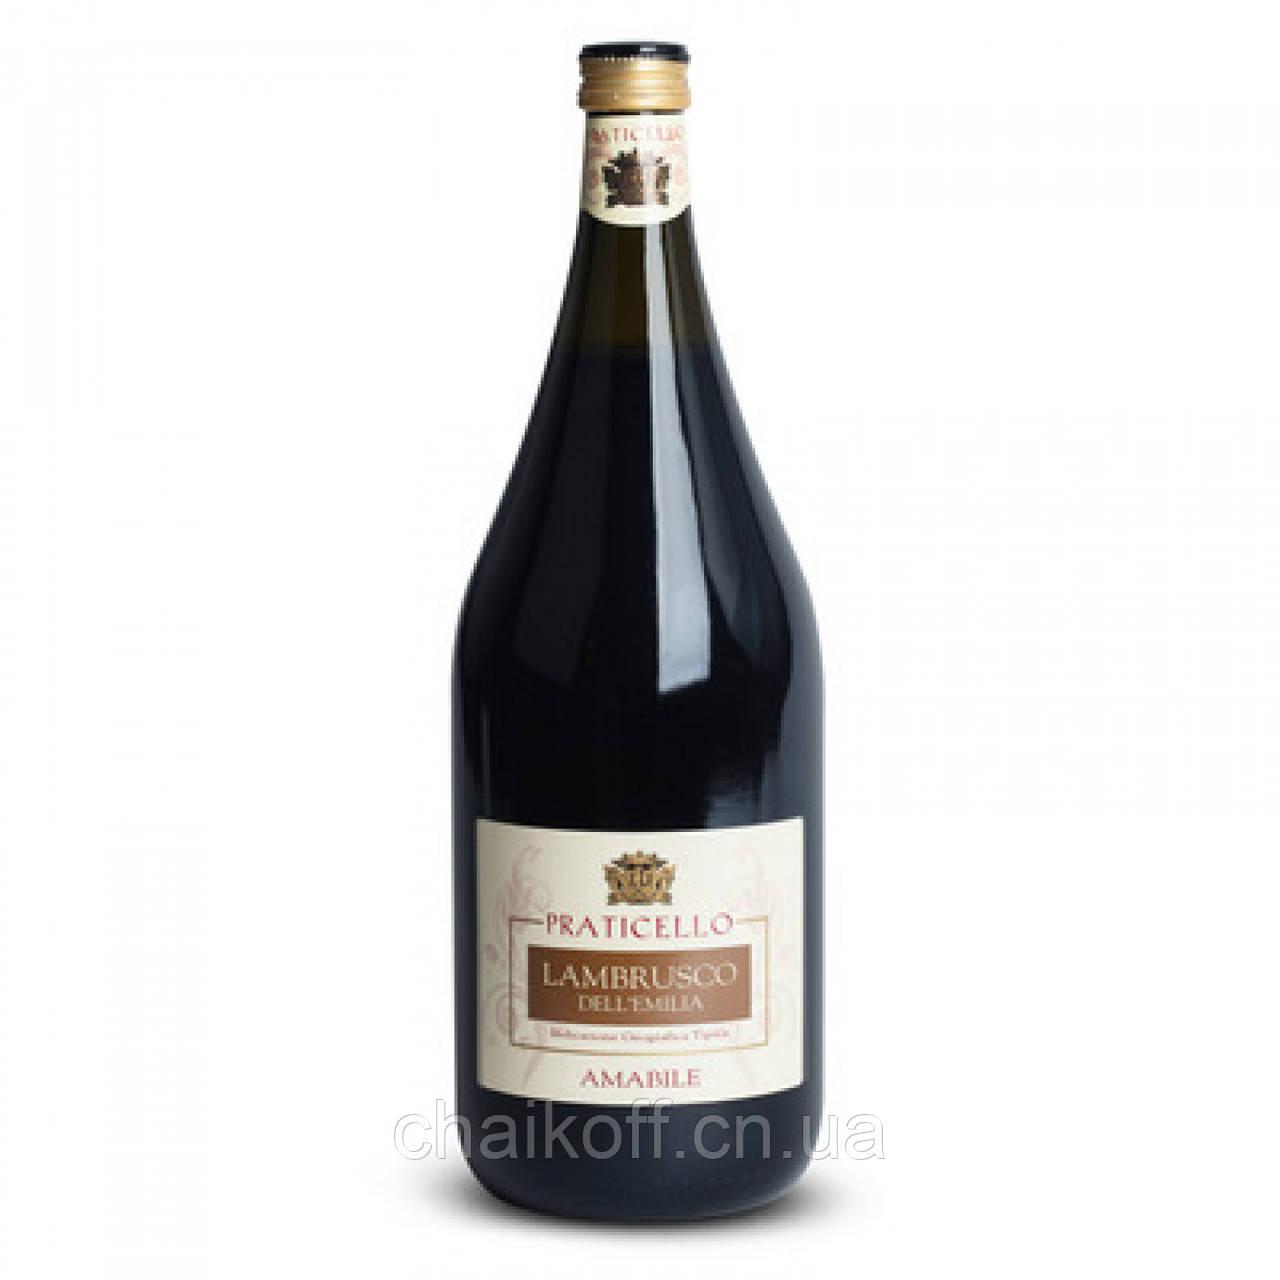 Игристое вино Lambrusco Praticello Dell'Emilia Amabile 1.5 л (Италия)